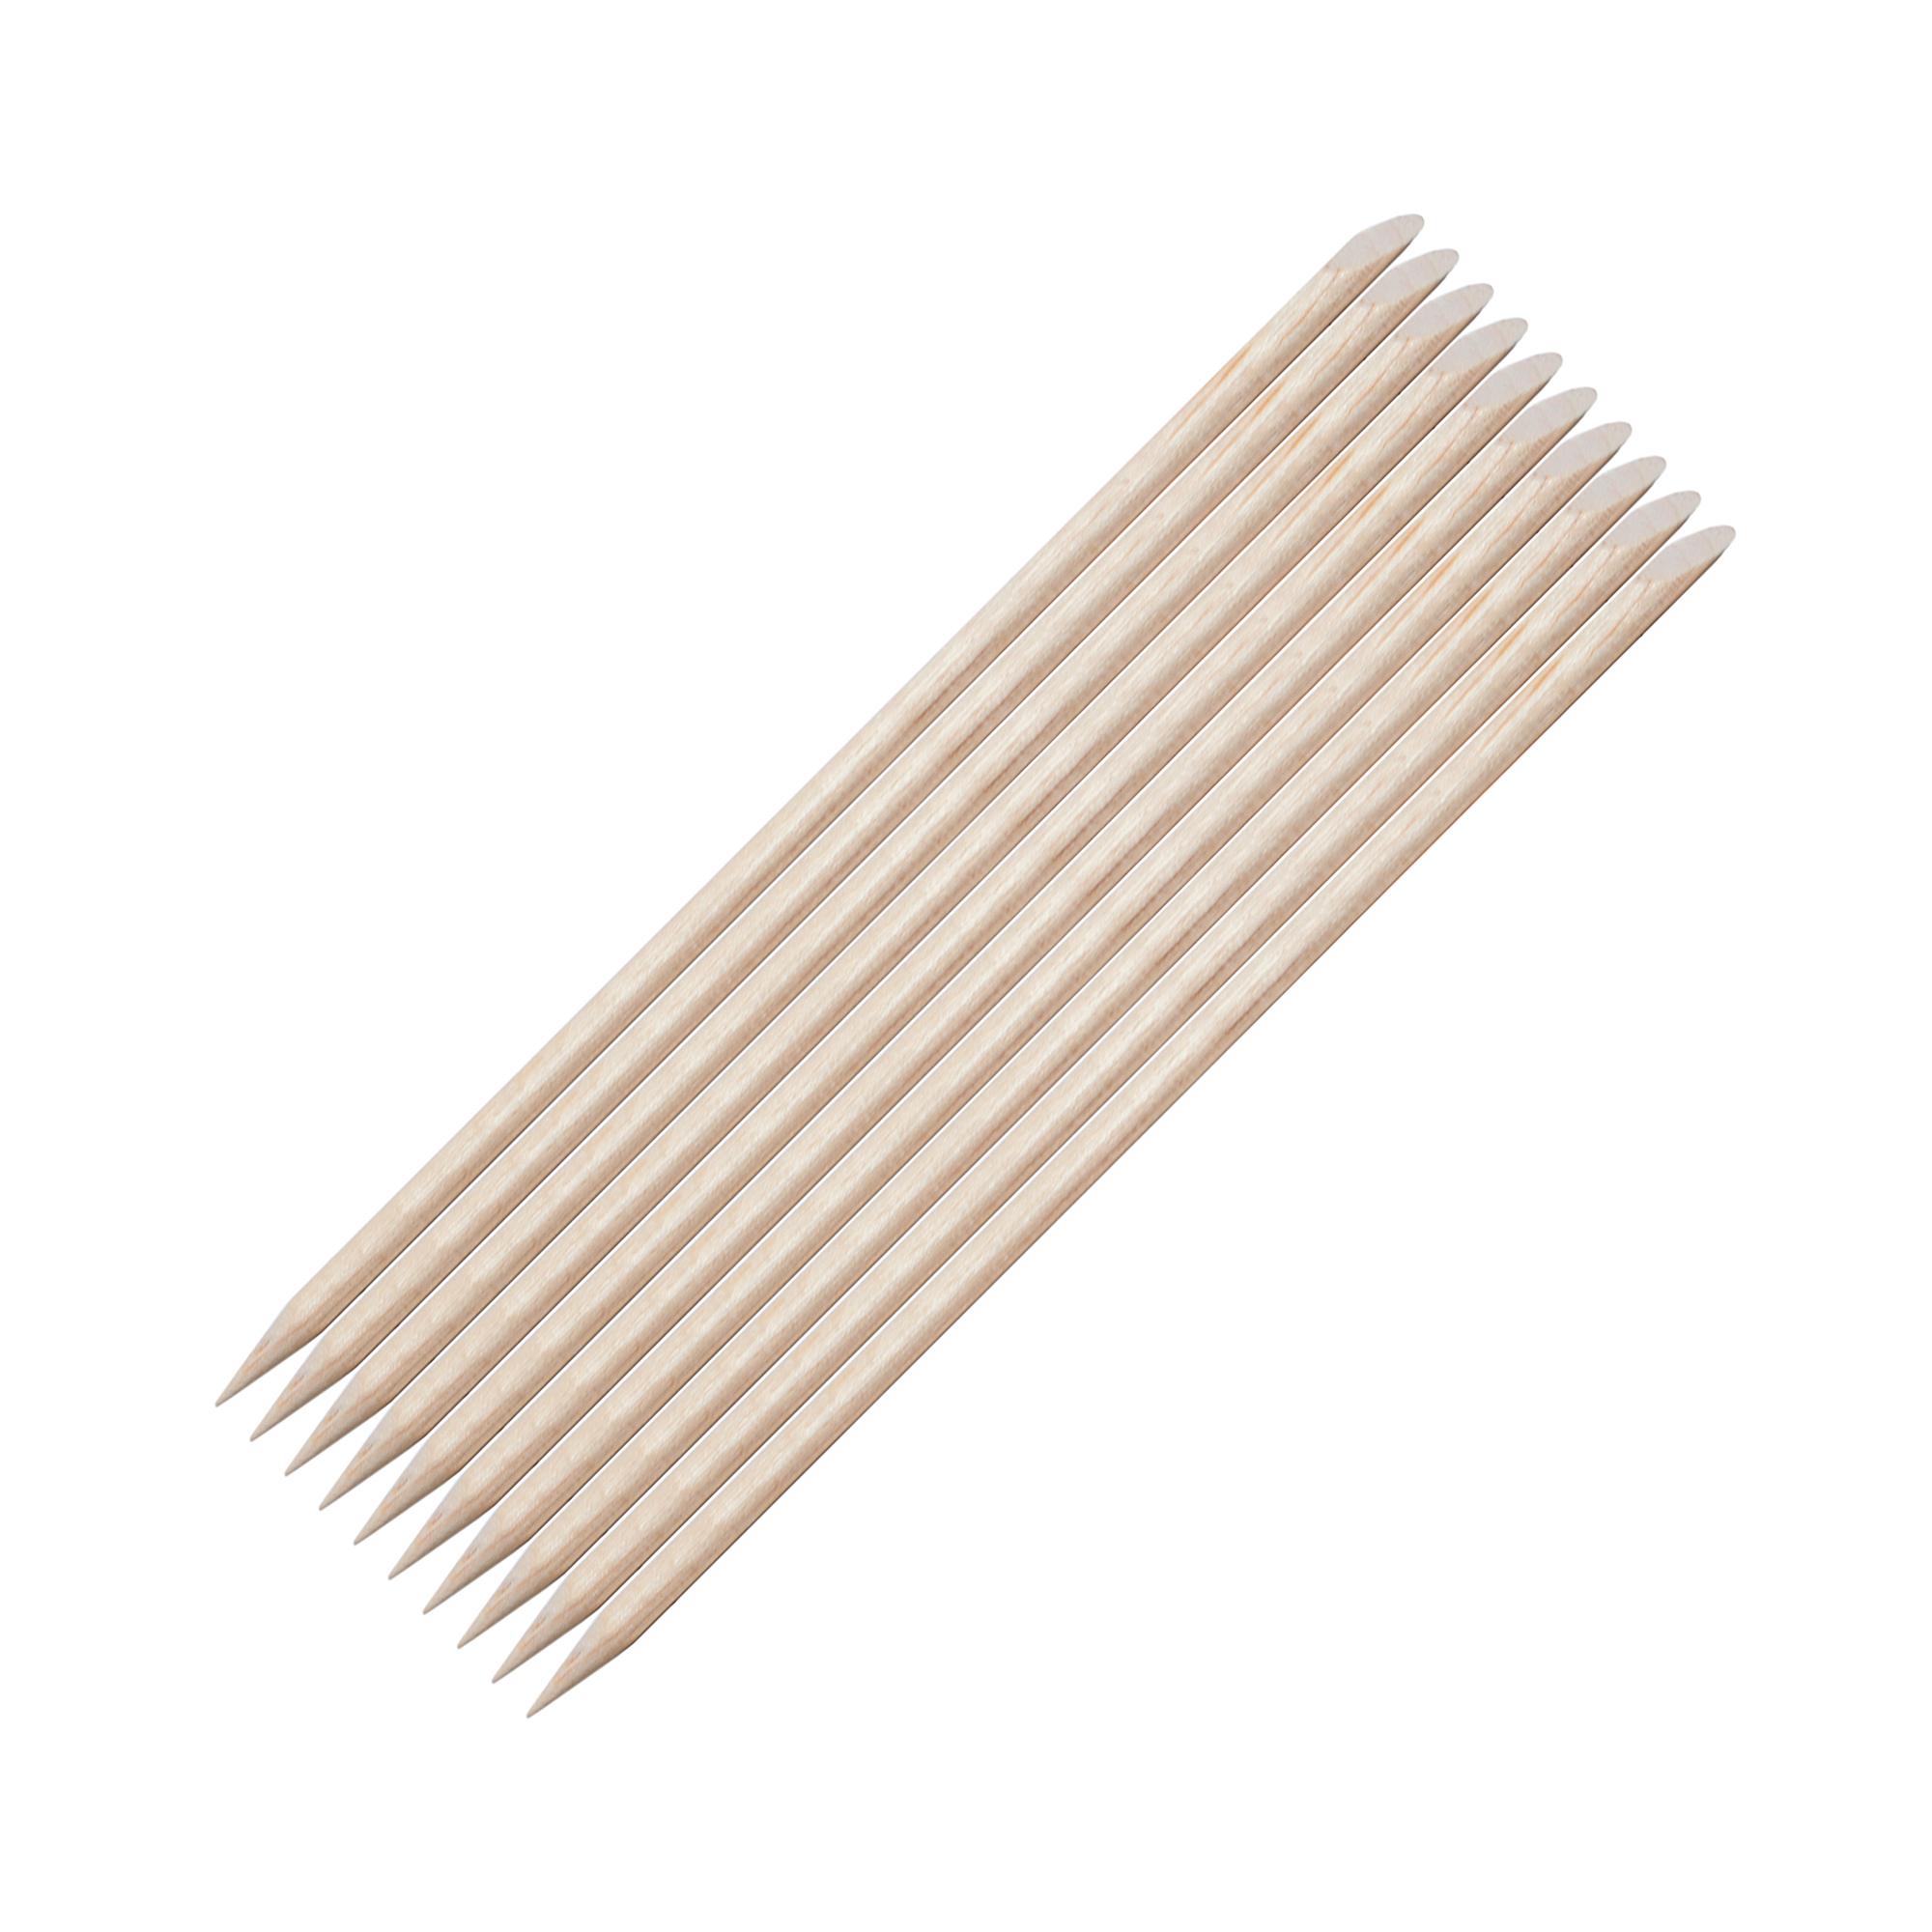 BERENICE Палочка апельсиновая 13 см (набор 10 шт) / BERENICE